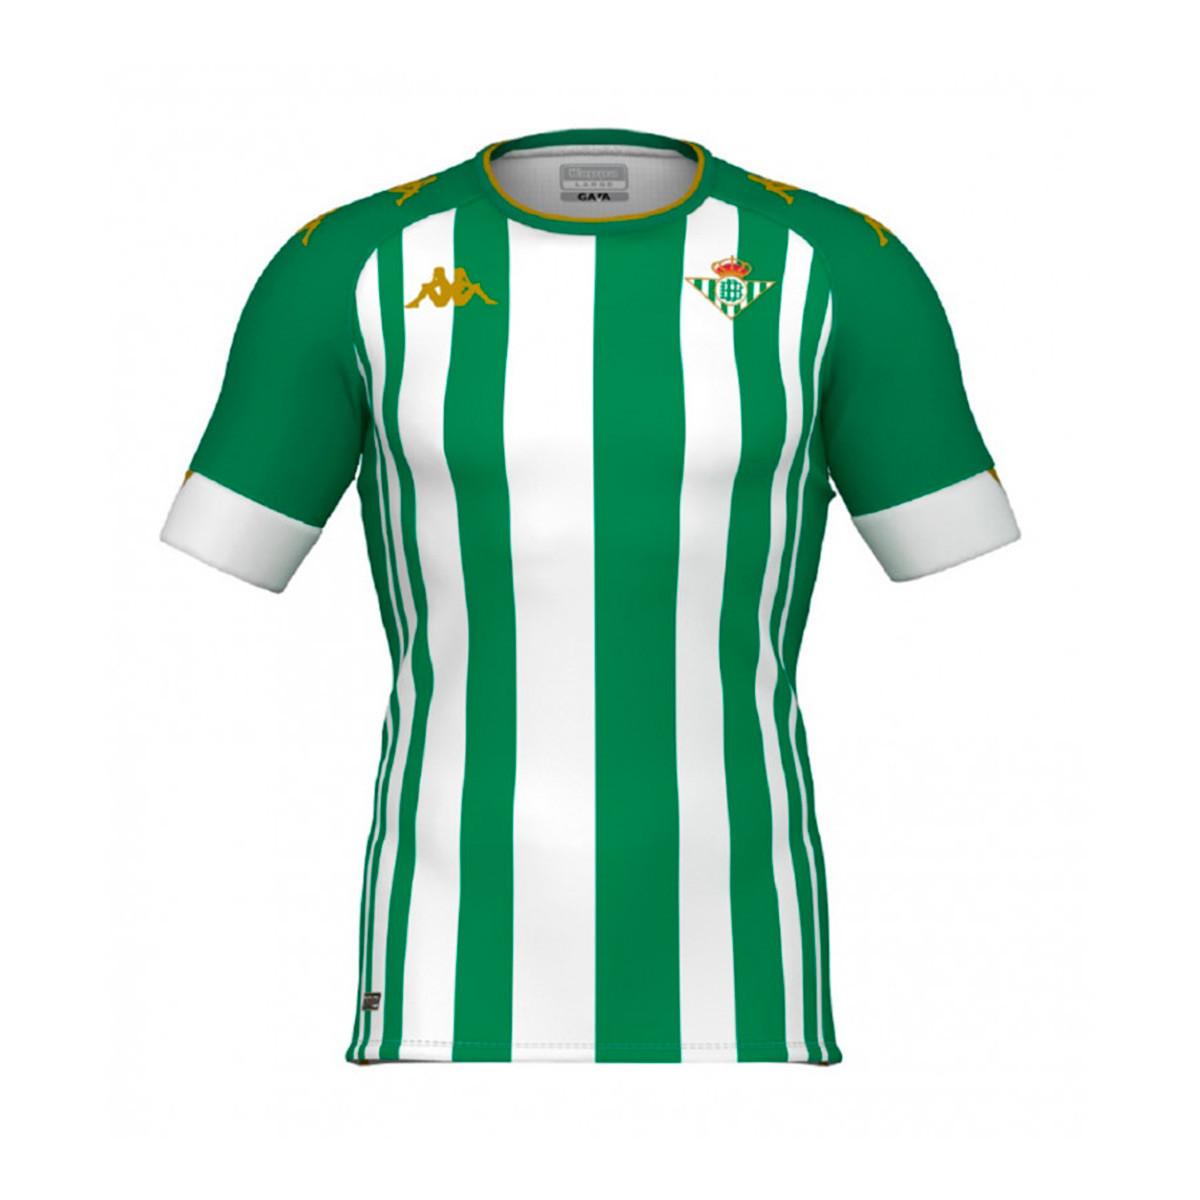 Kappa Real Betis Balompié Primera Equipación Pro 2020-2021 Jersey